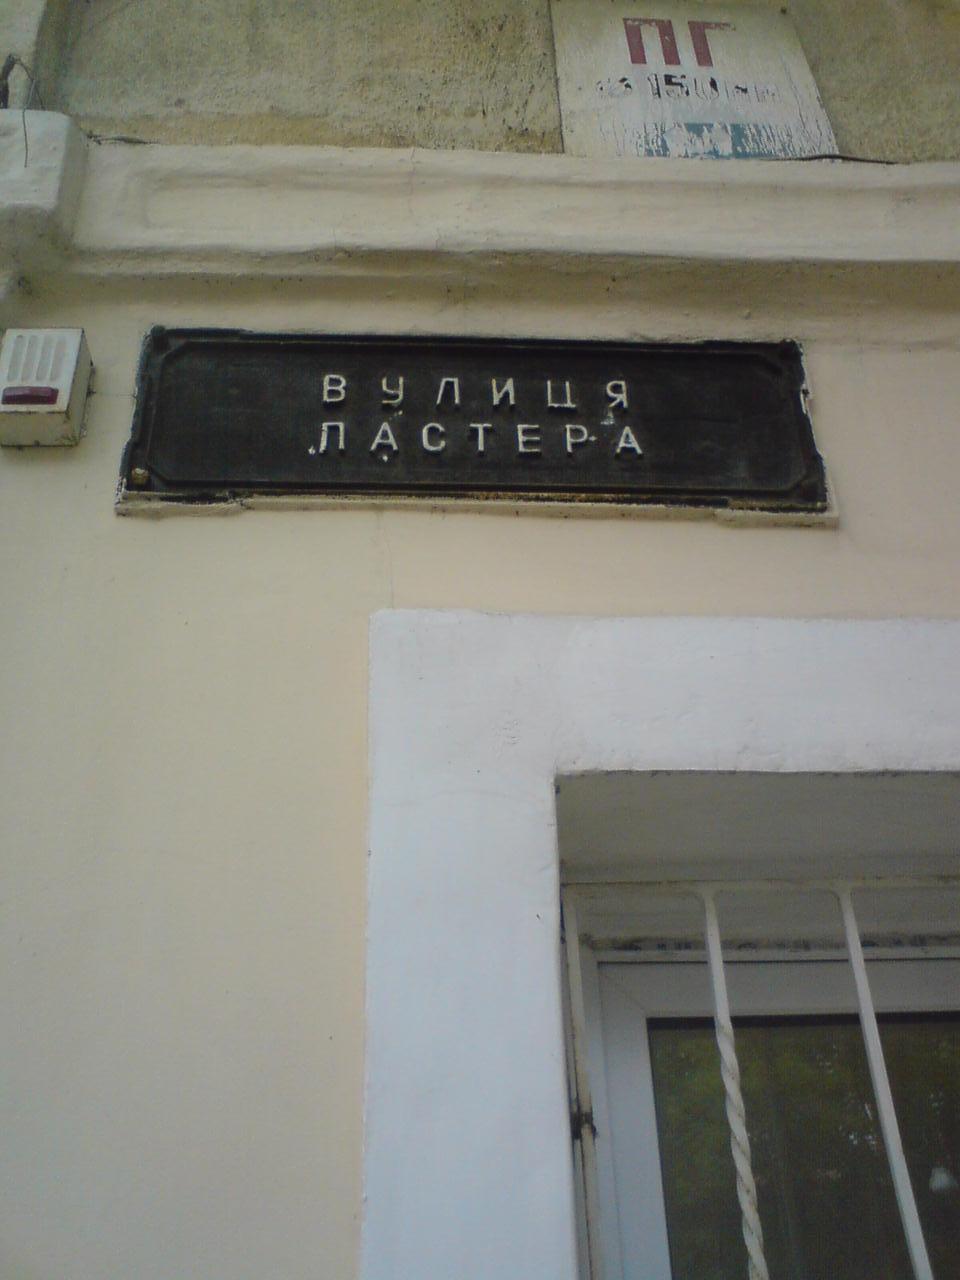 Vulitsya Pastera or Pasteur Street in Odessa, Ukraine